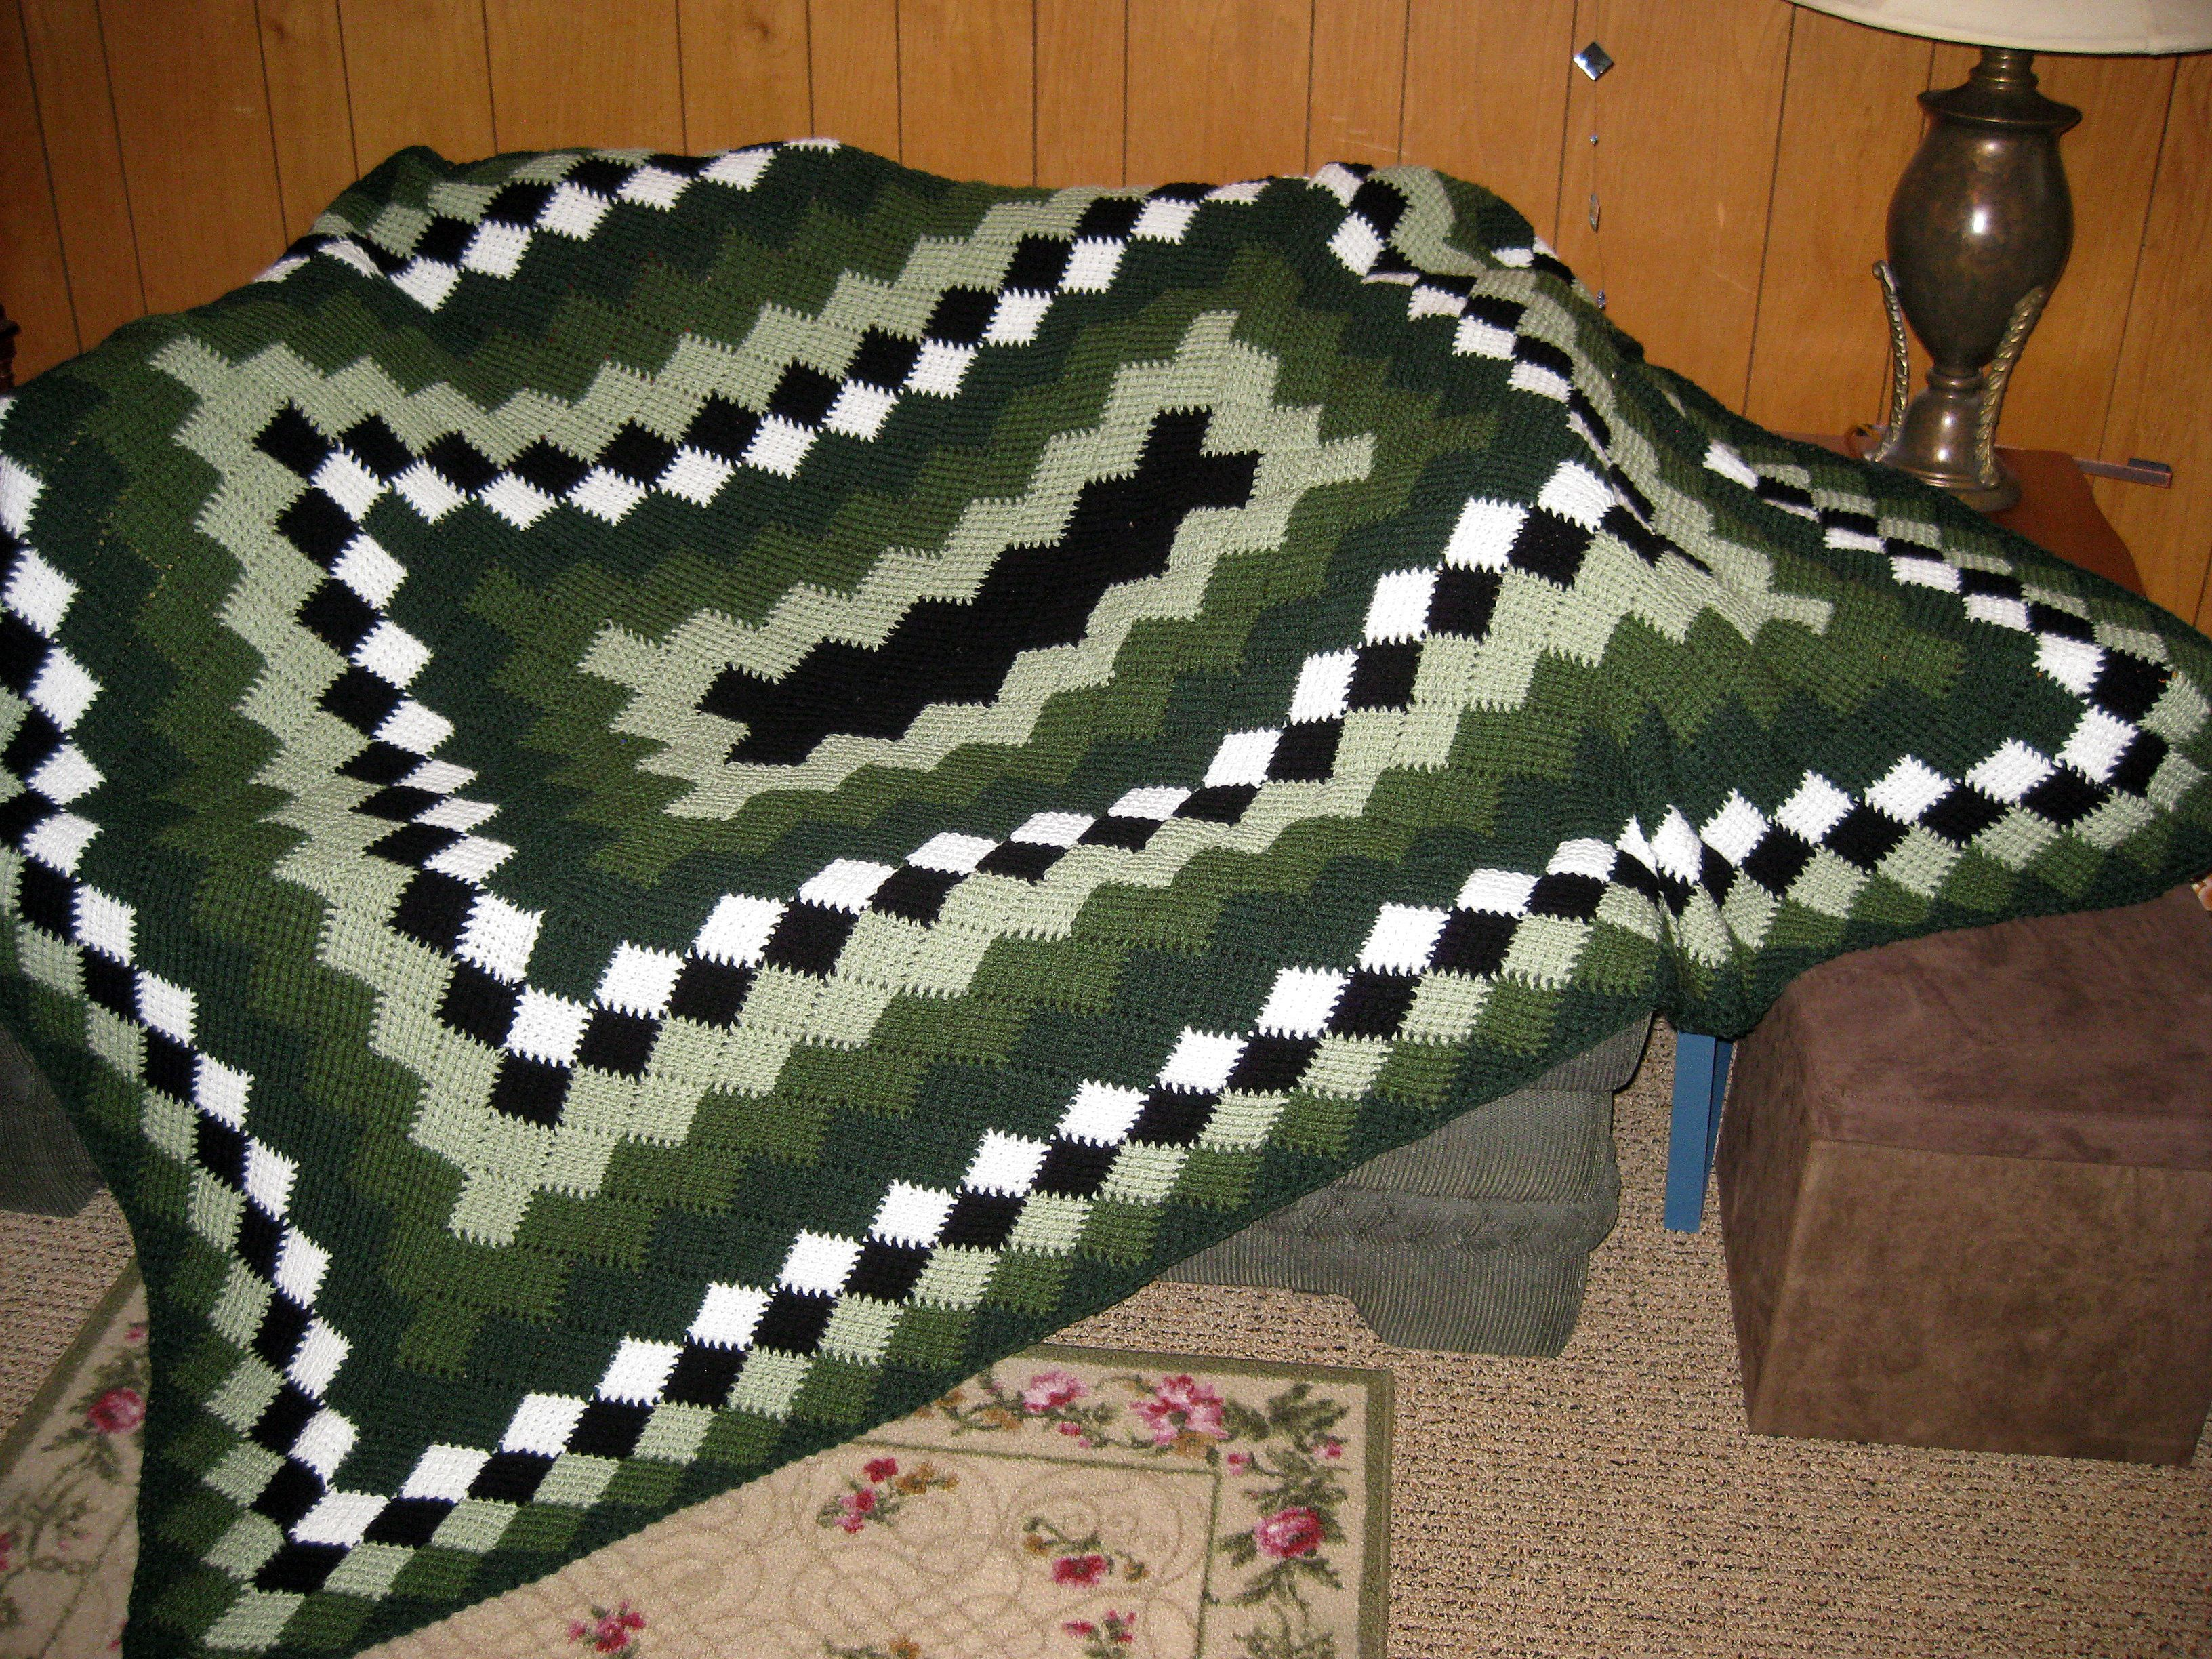 Pin by Karen Mulholland-Lindsay on My Crochet Pattern ...